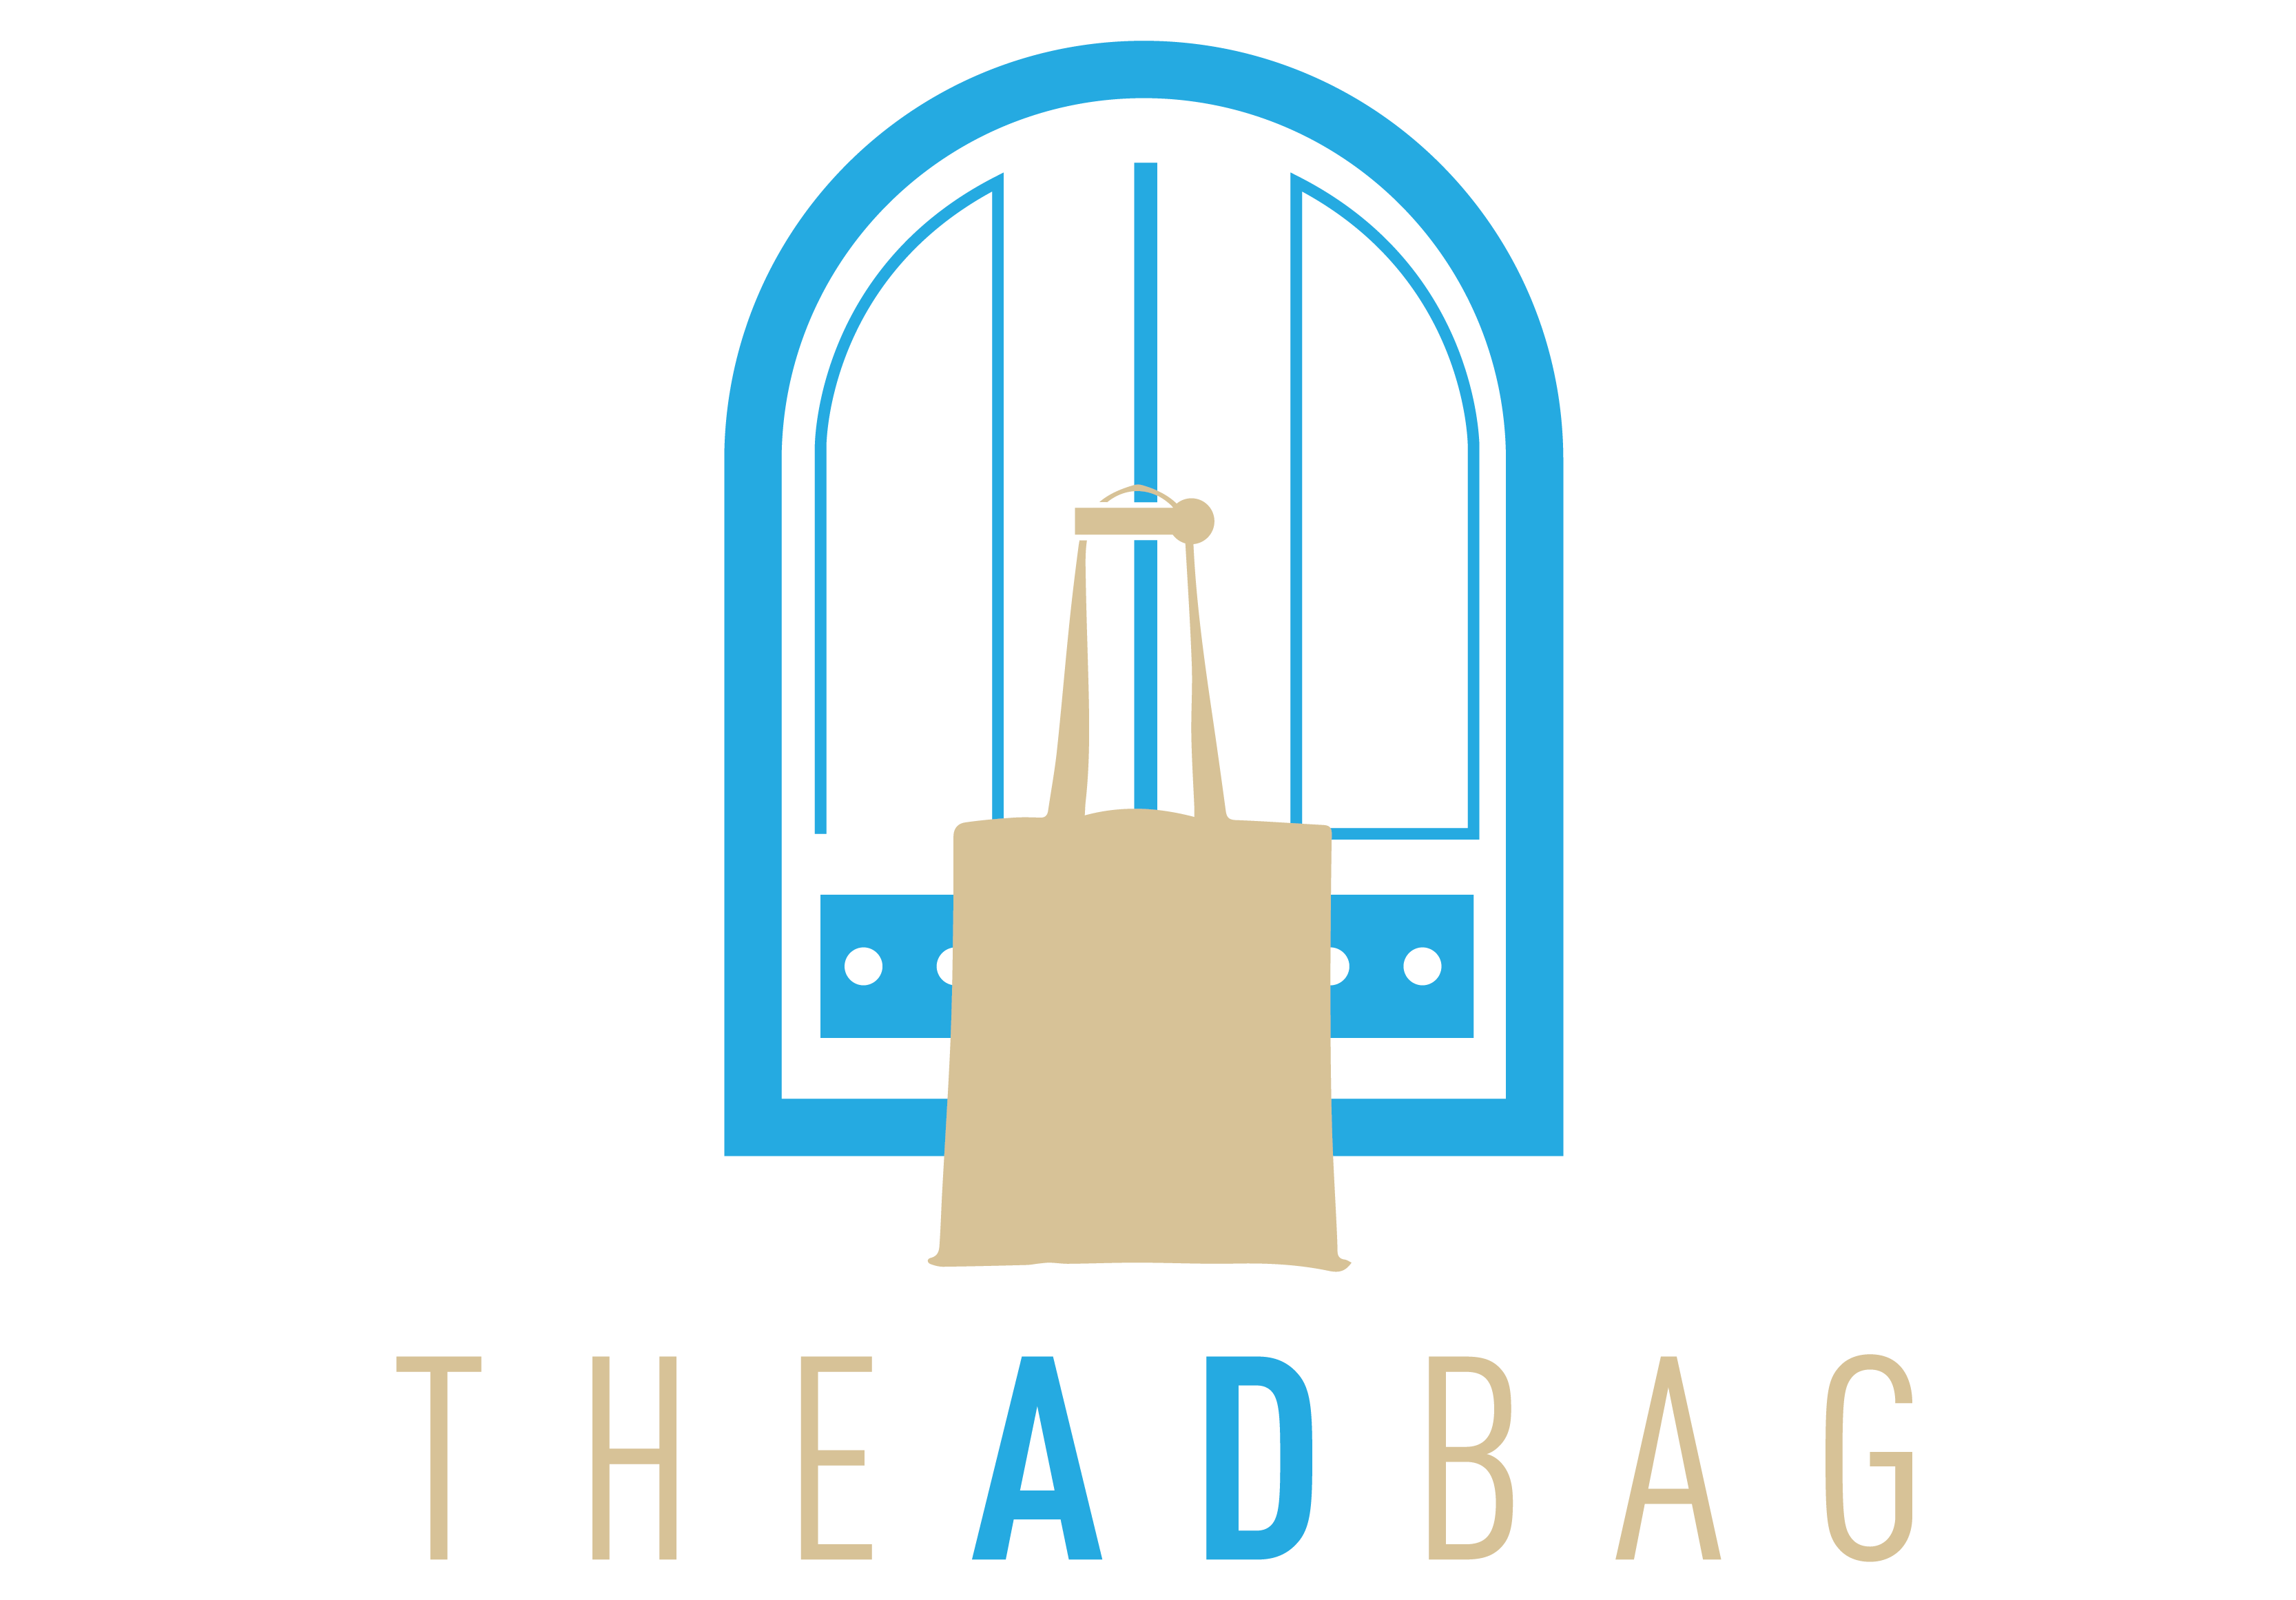 TheAdBag